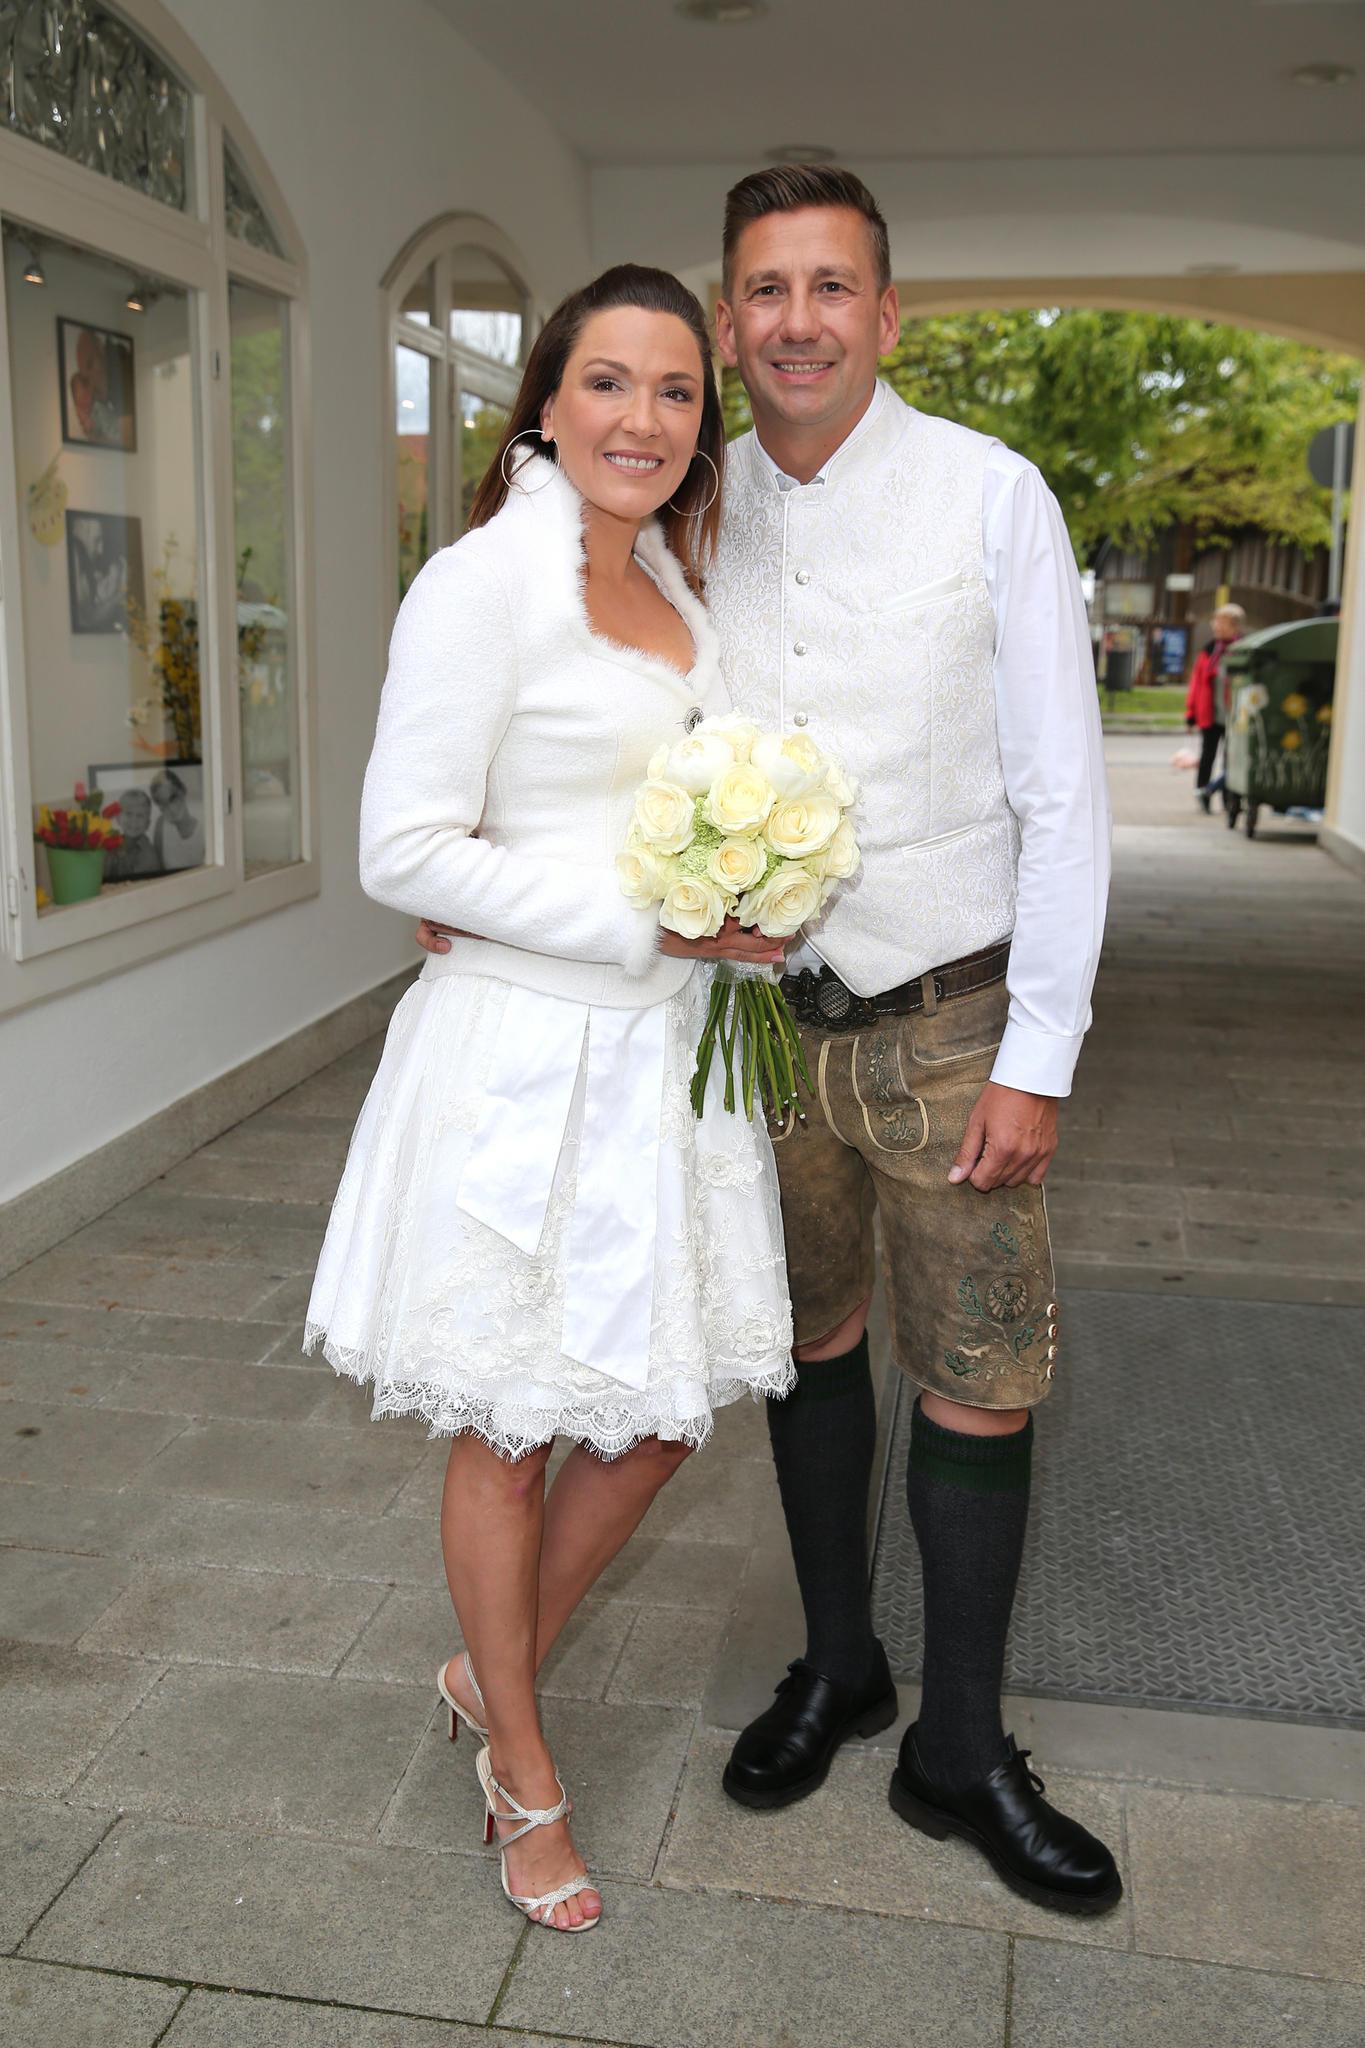 6ce12646b5ed0e Simone Ballack nach der Hochzeit: Neuer Nachname | GALA.de